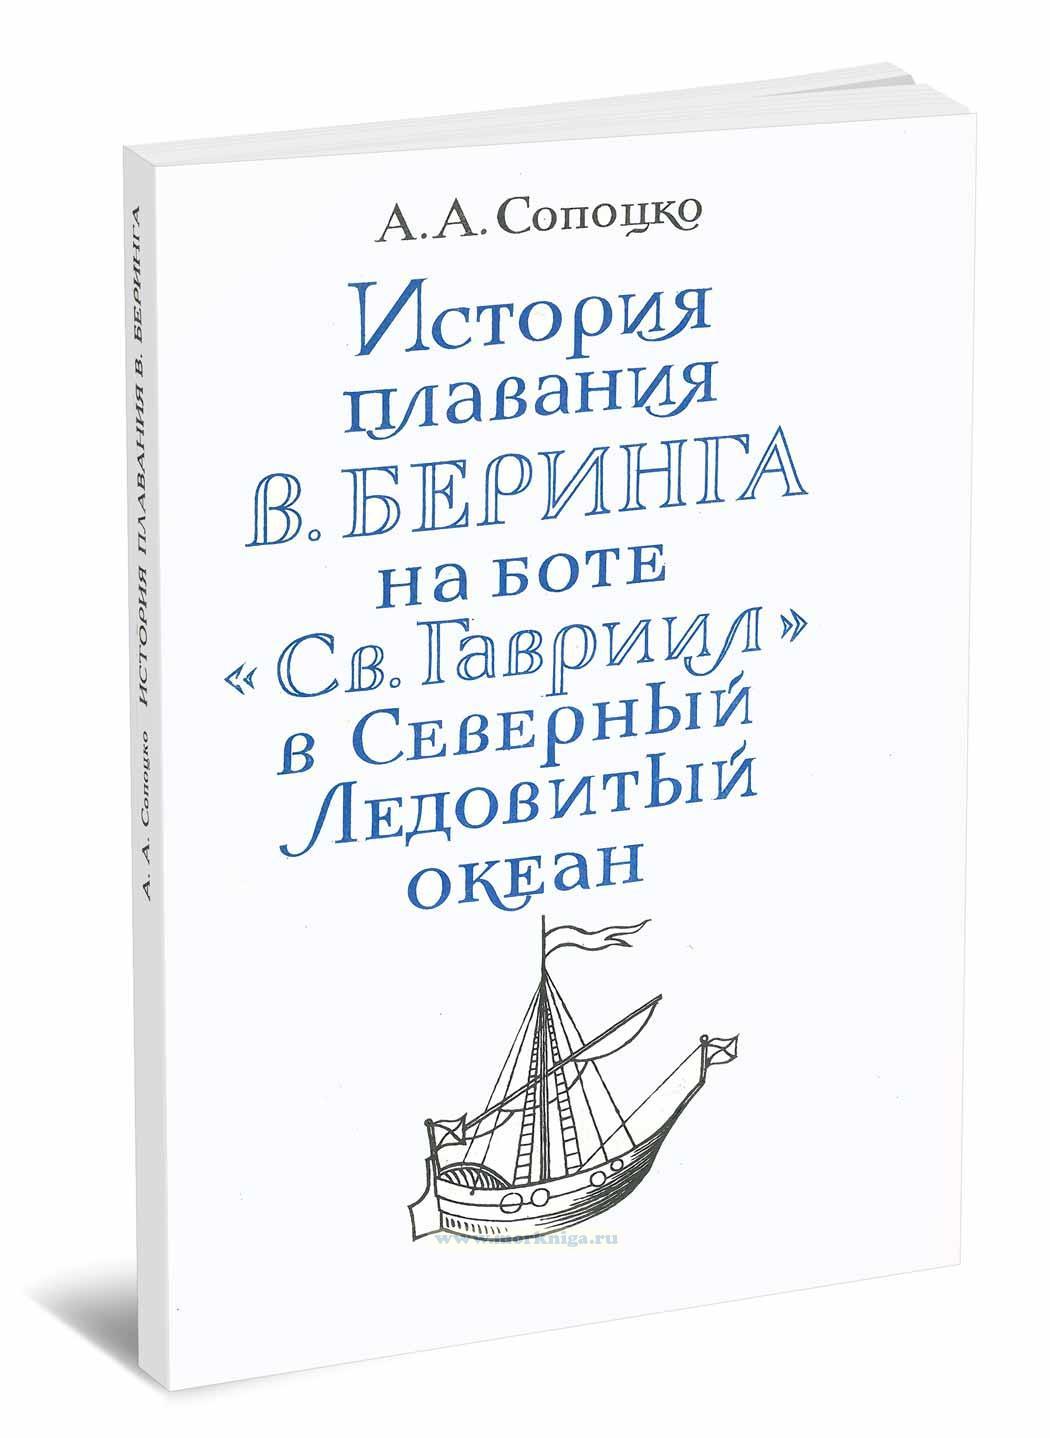 История плавания В.Беринга на боте